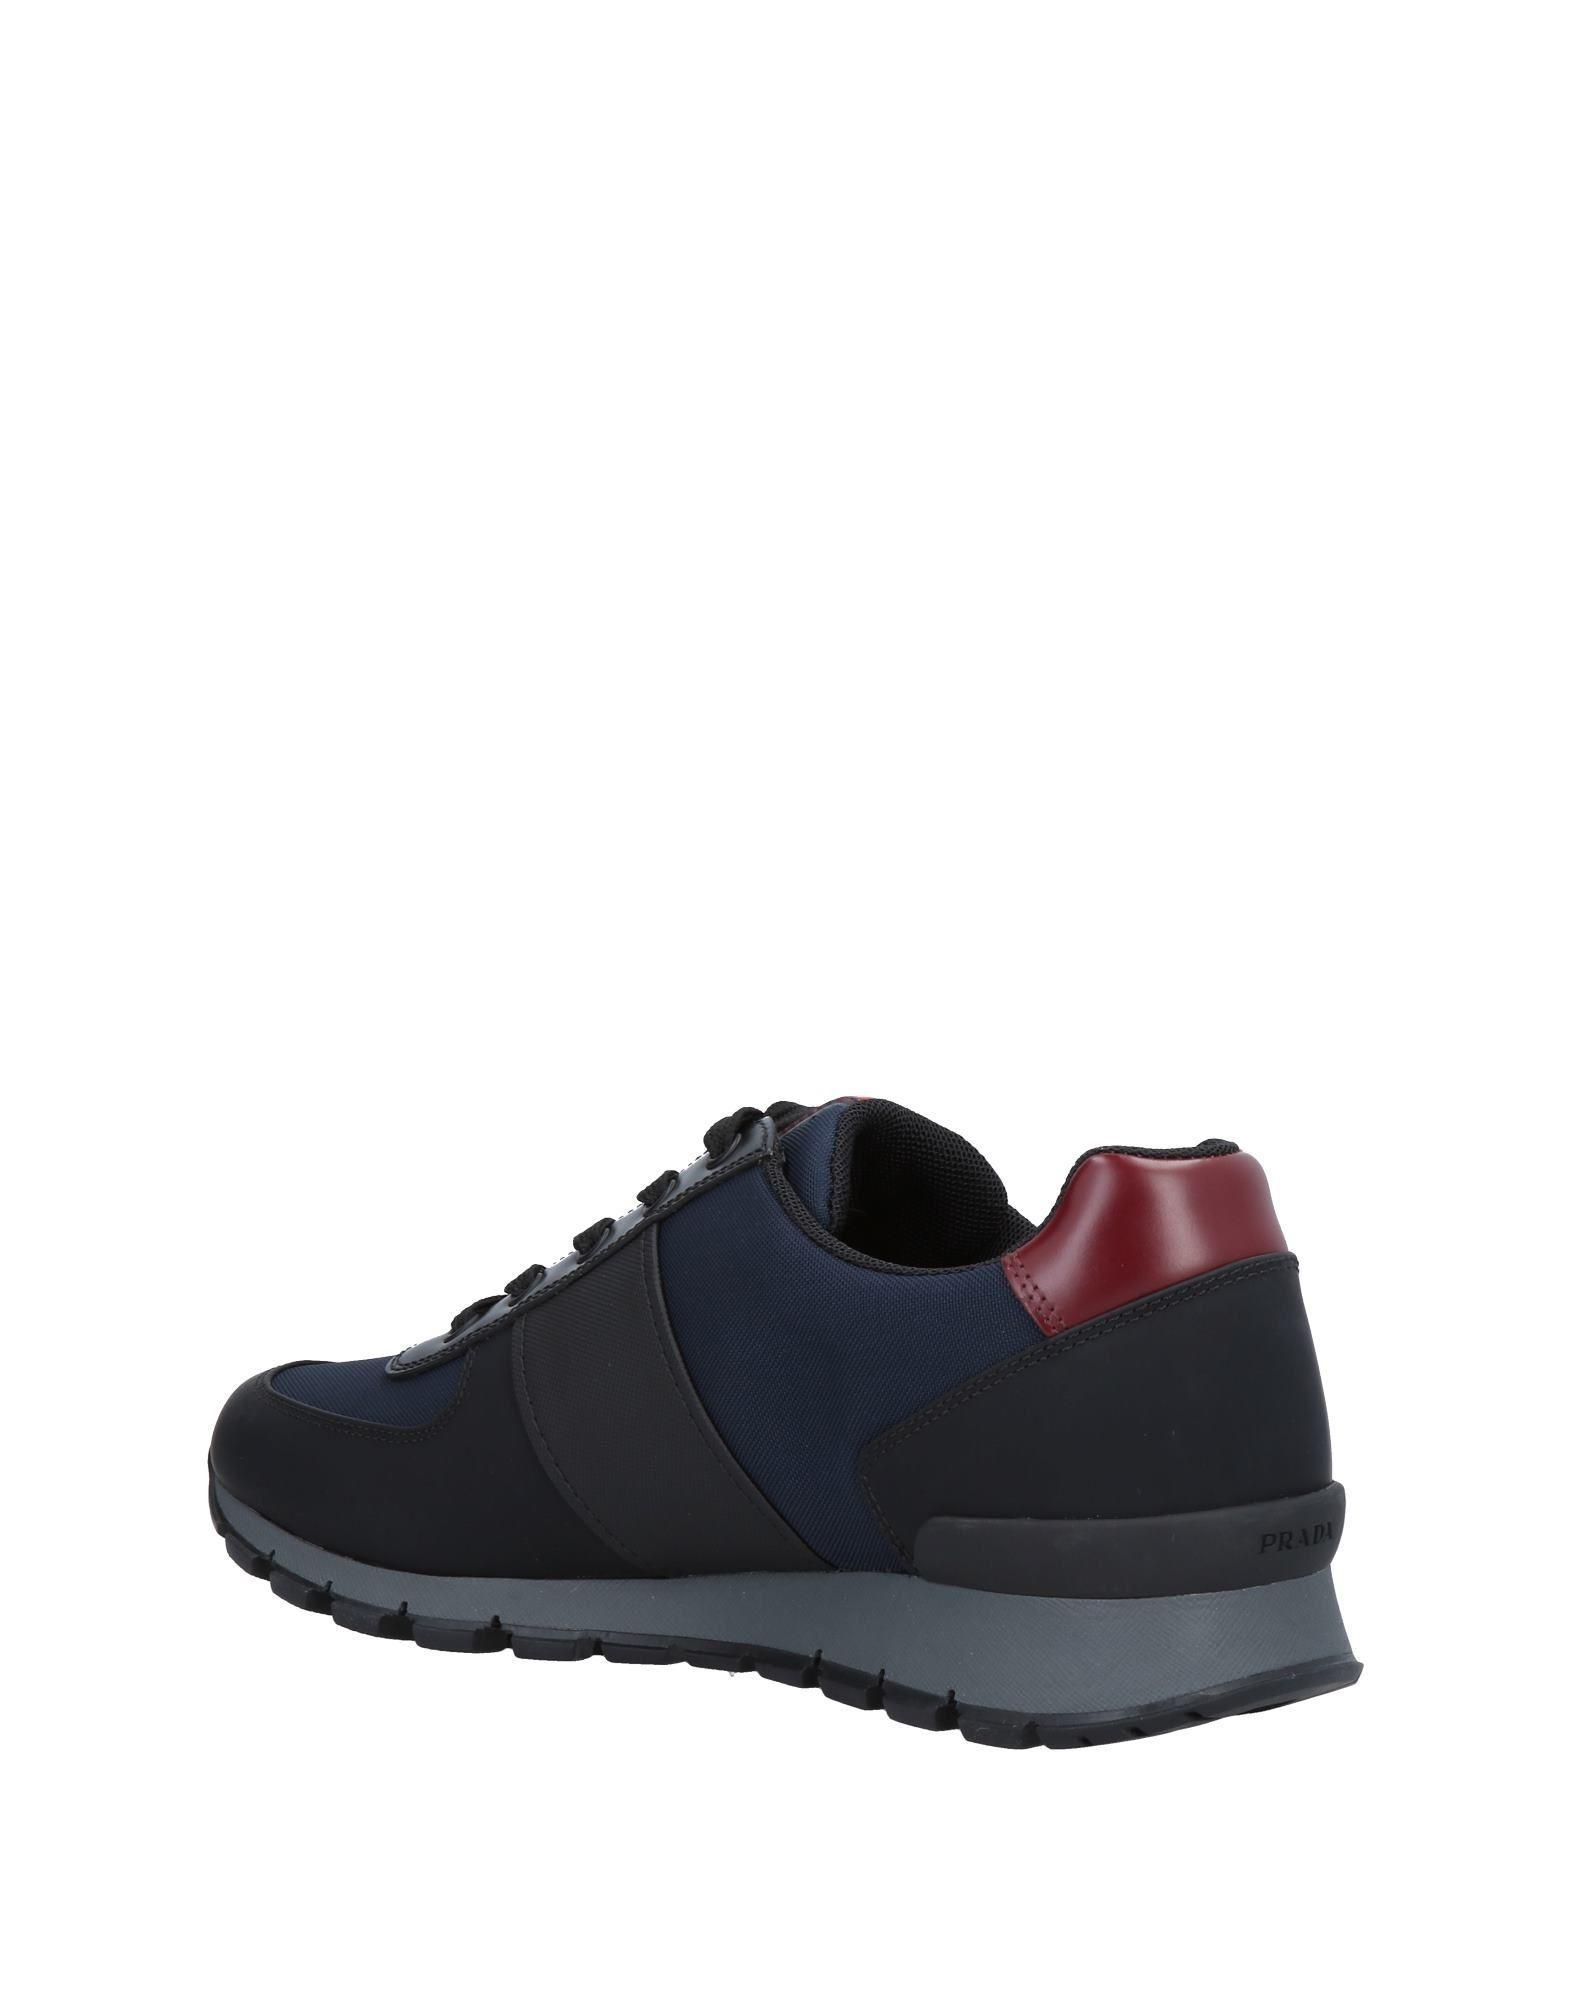 Prada Sport Rubber Low-tops & Sneakers in Dark Blue (Blue)